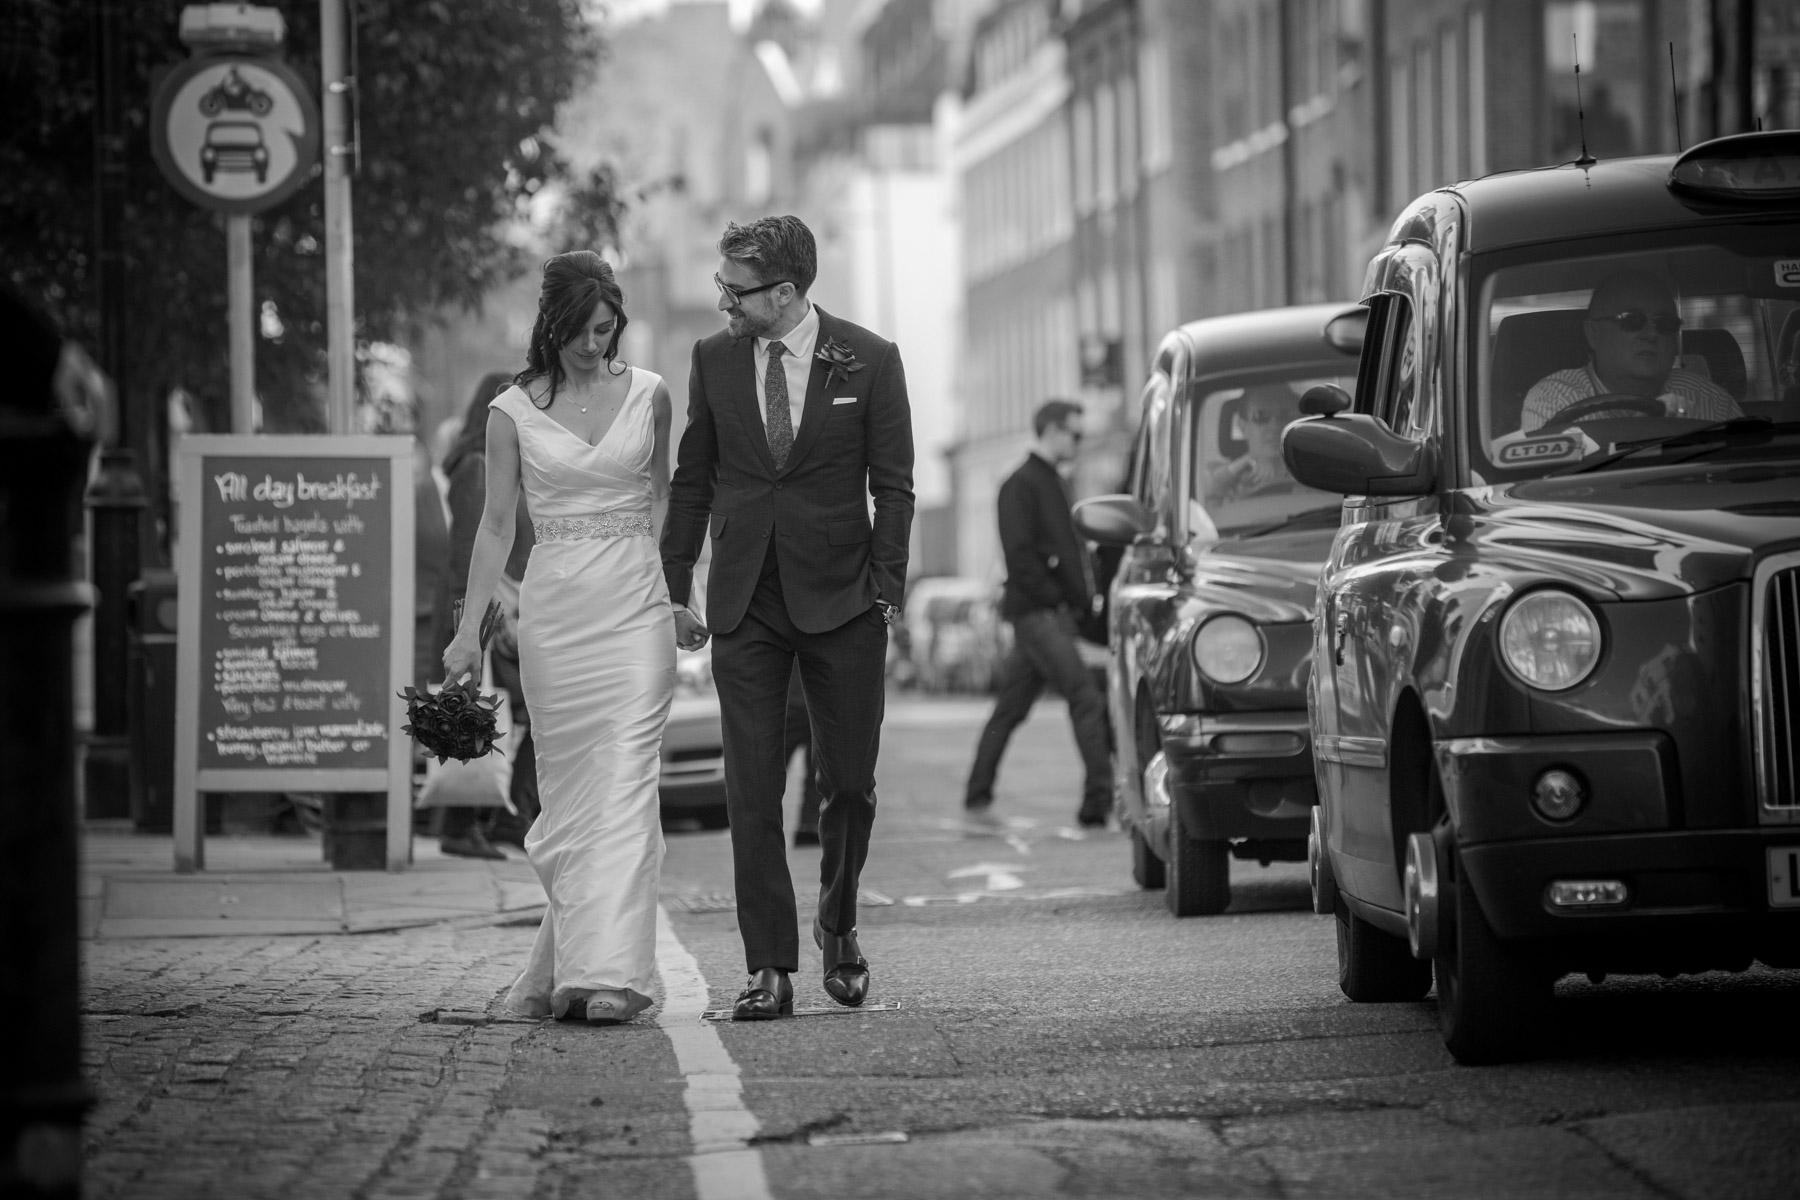 London Documentary Wedding Photography  Storytelling through documentary photography